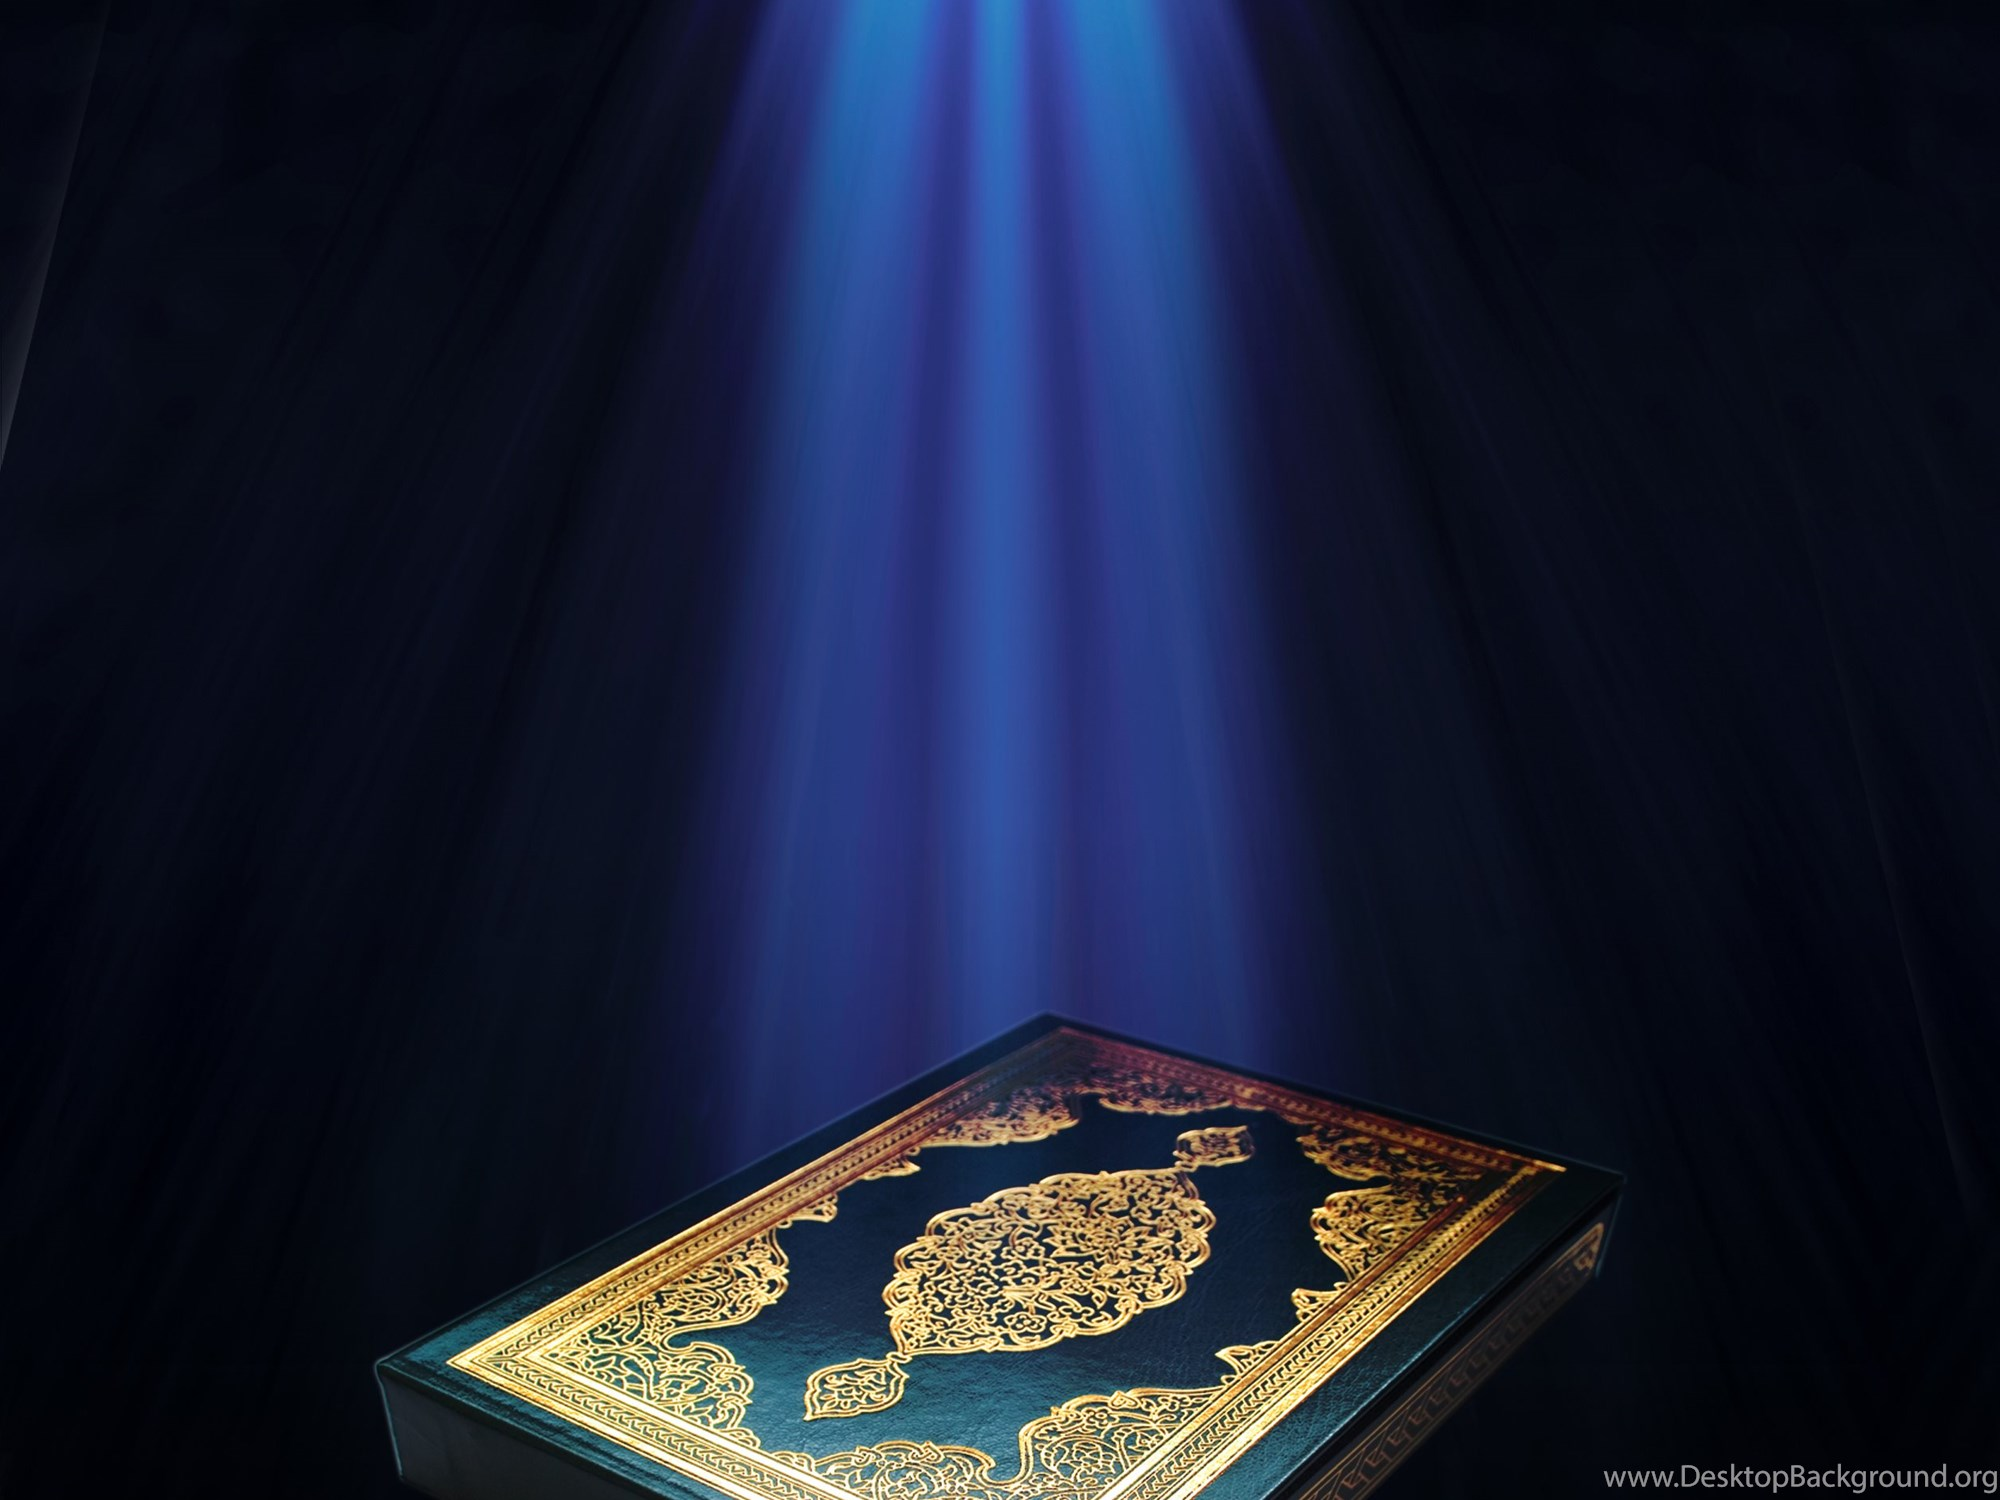 Quran wallpapers hd in urdu gallery iphhone download - Quran wallpaper gallery ...